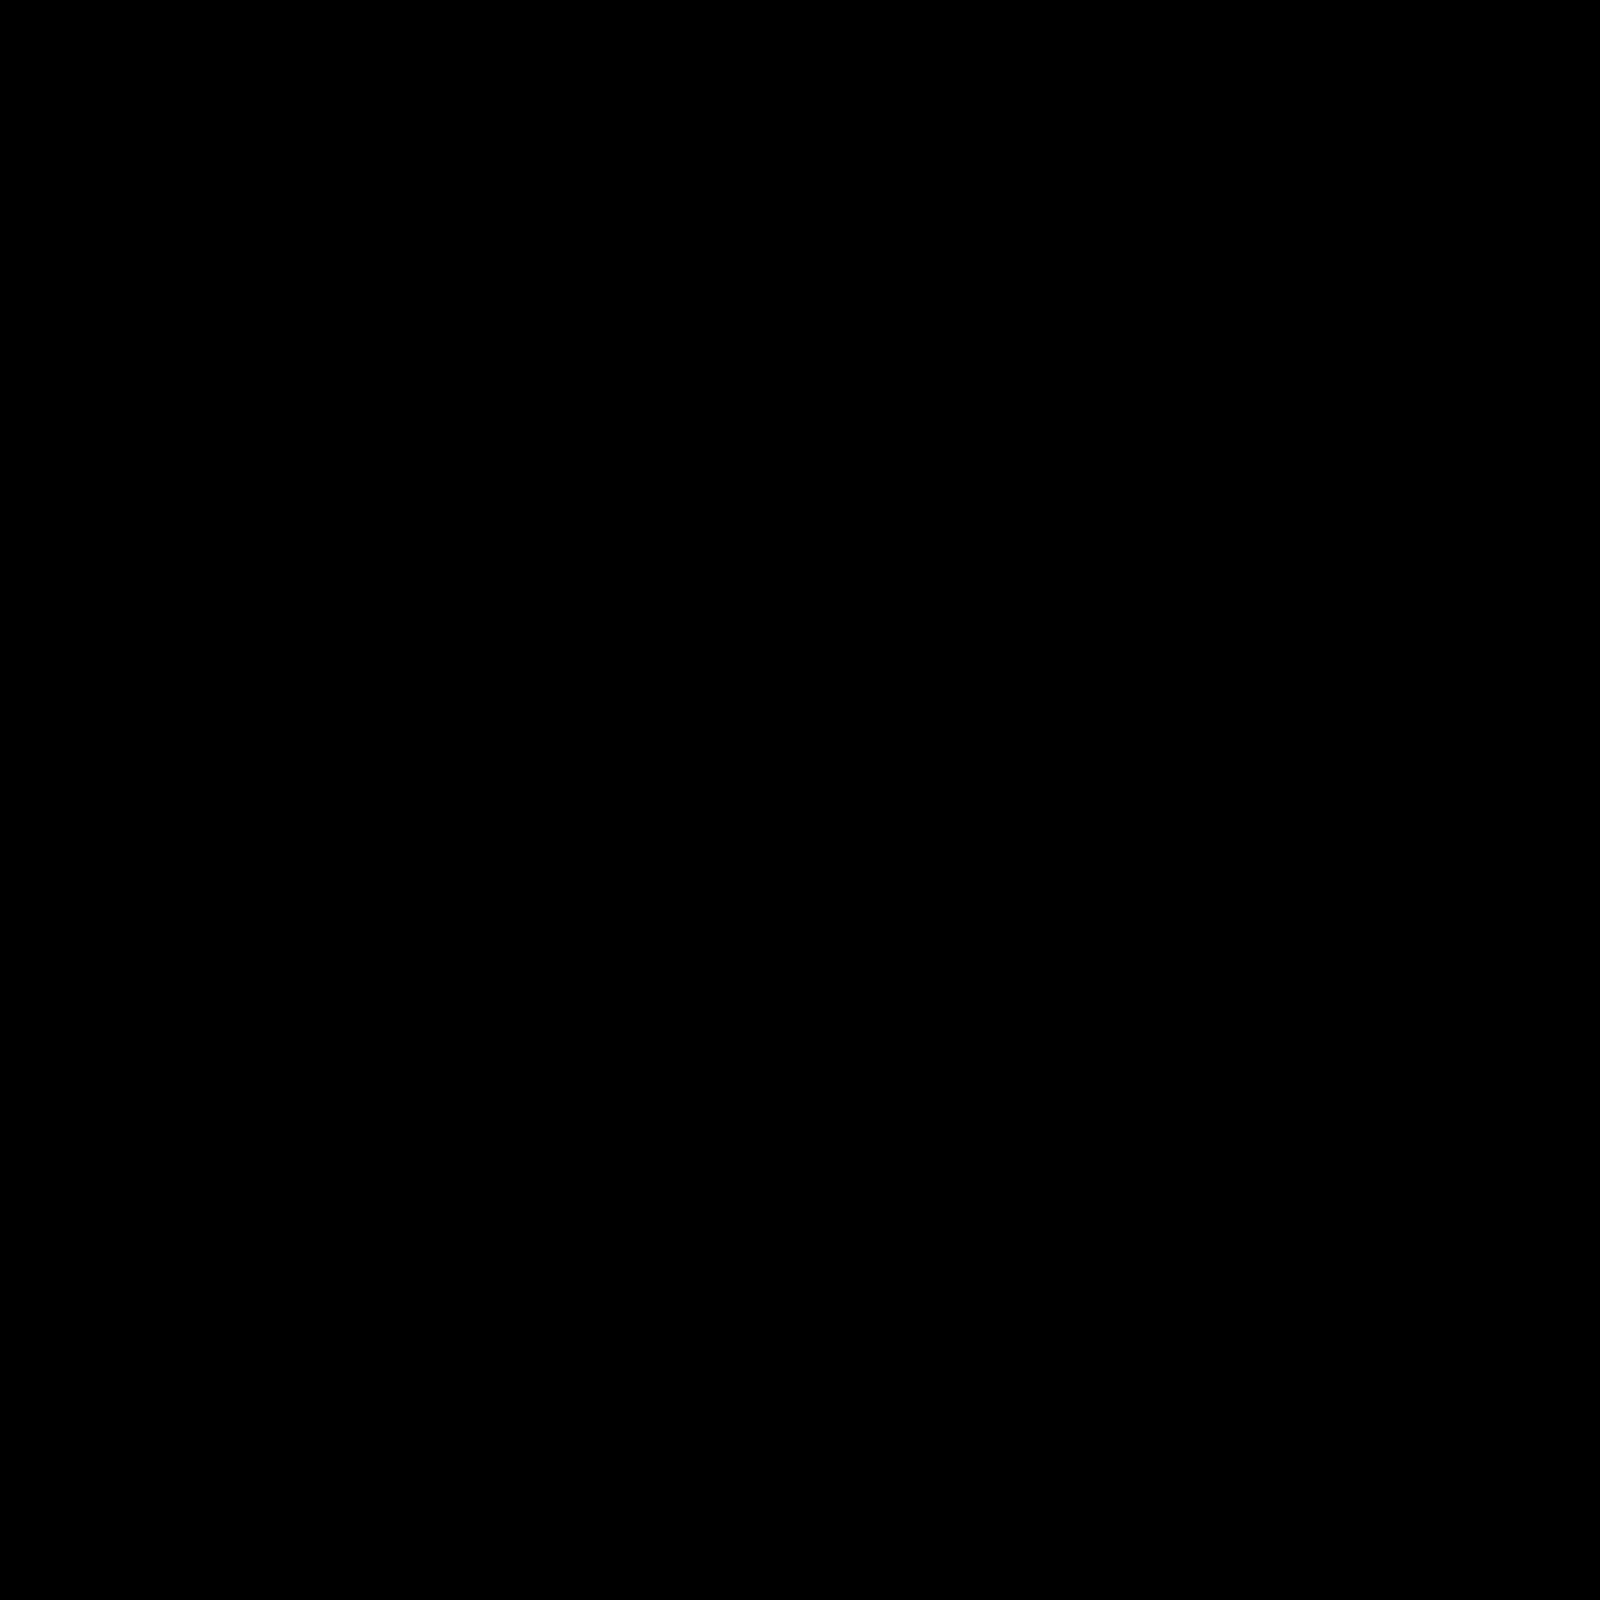 Tank Mine Filled icon